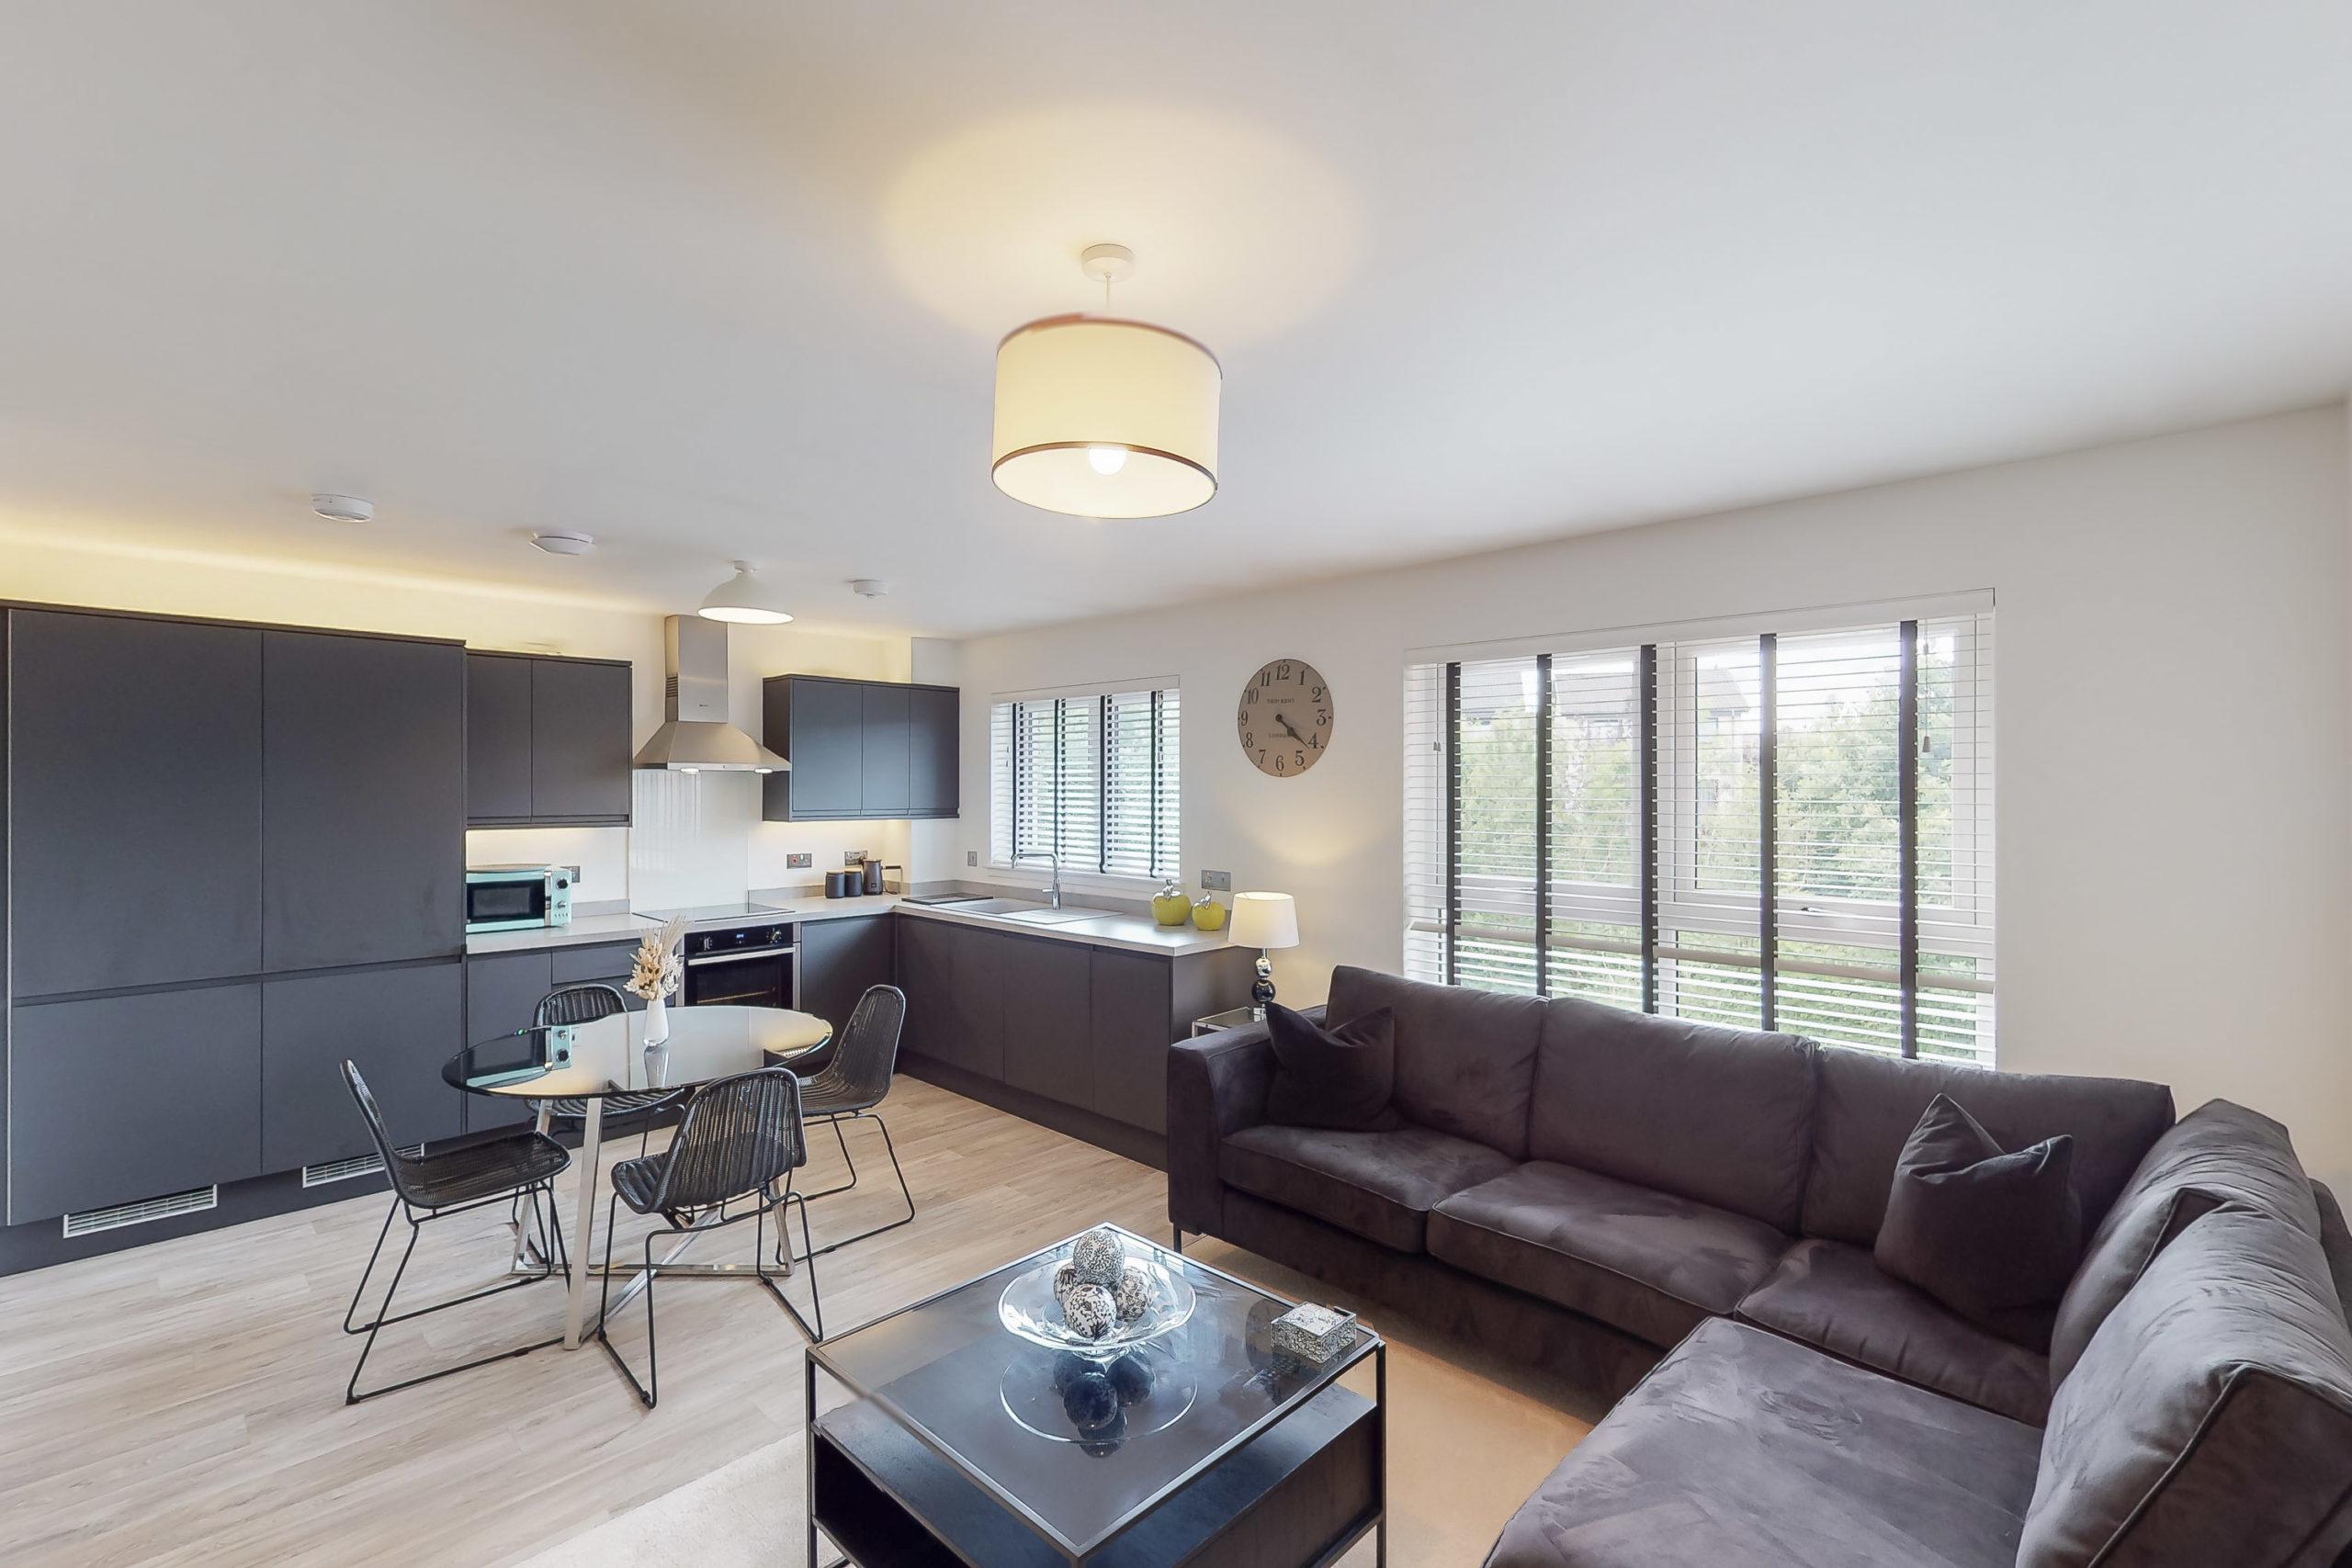 2 Bed Second Floor Apartment – 15 Hulbert Court, Perth, PH1 2AR